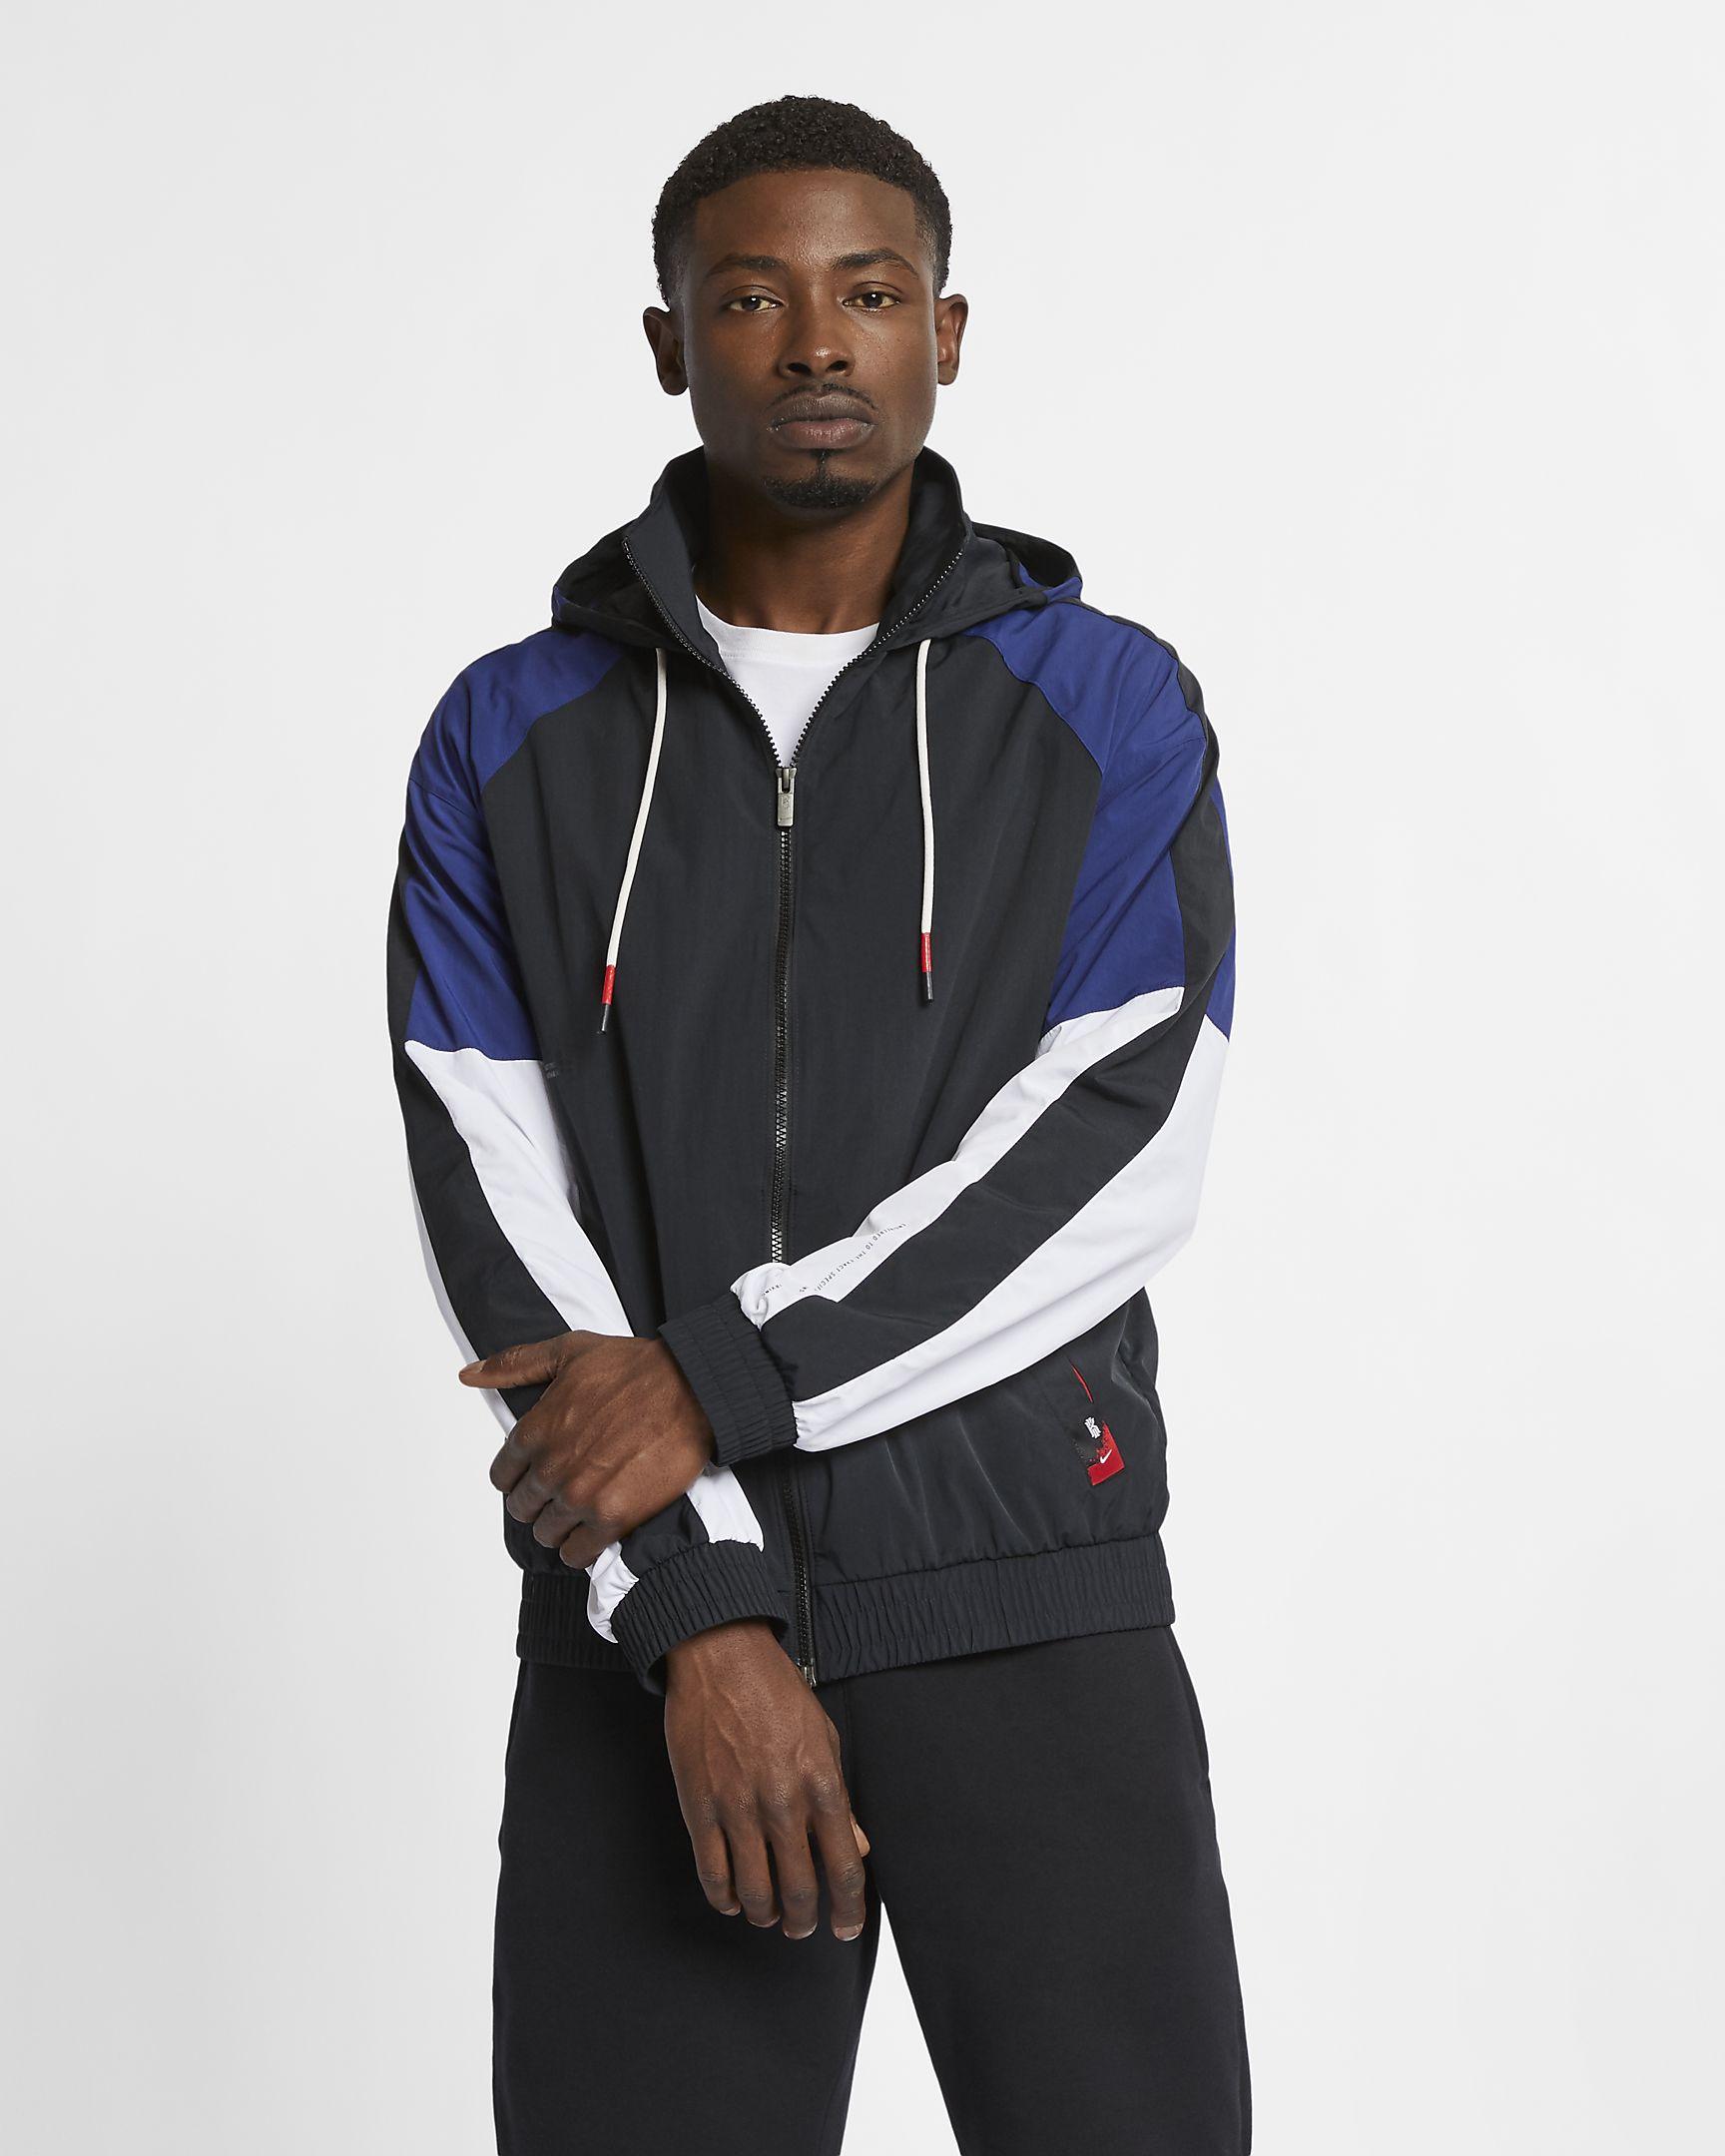 Nike 耐克 Kyrie 男子篮球夹克 优惠码折后¥359 三色可选